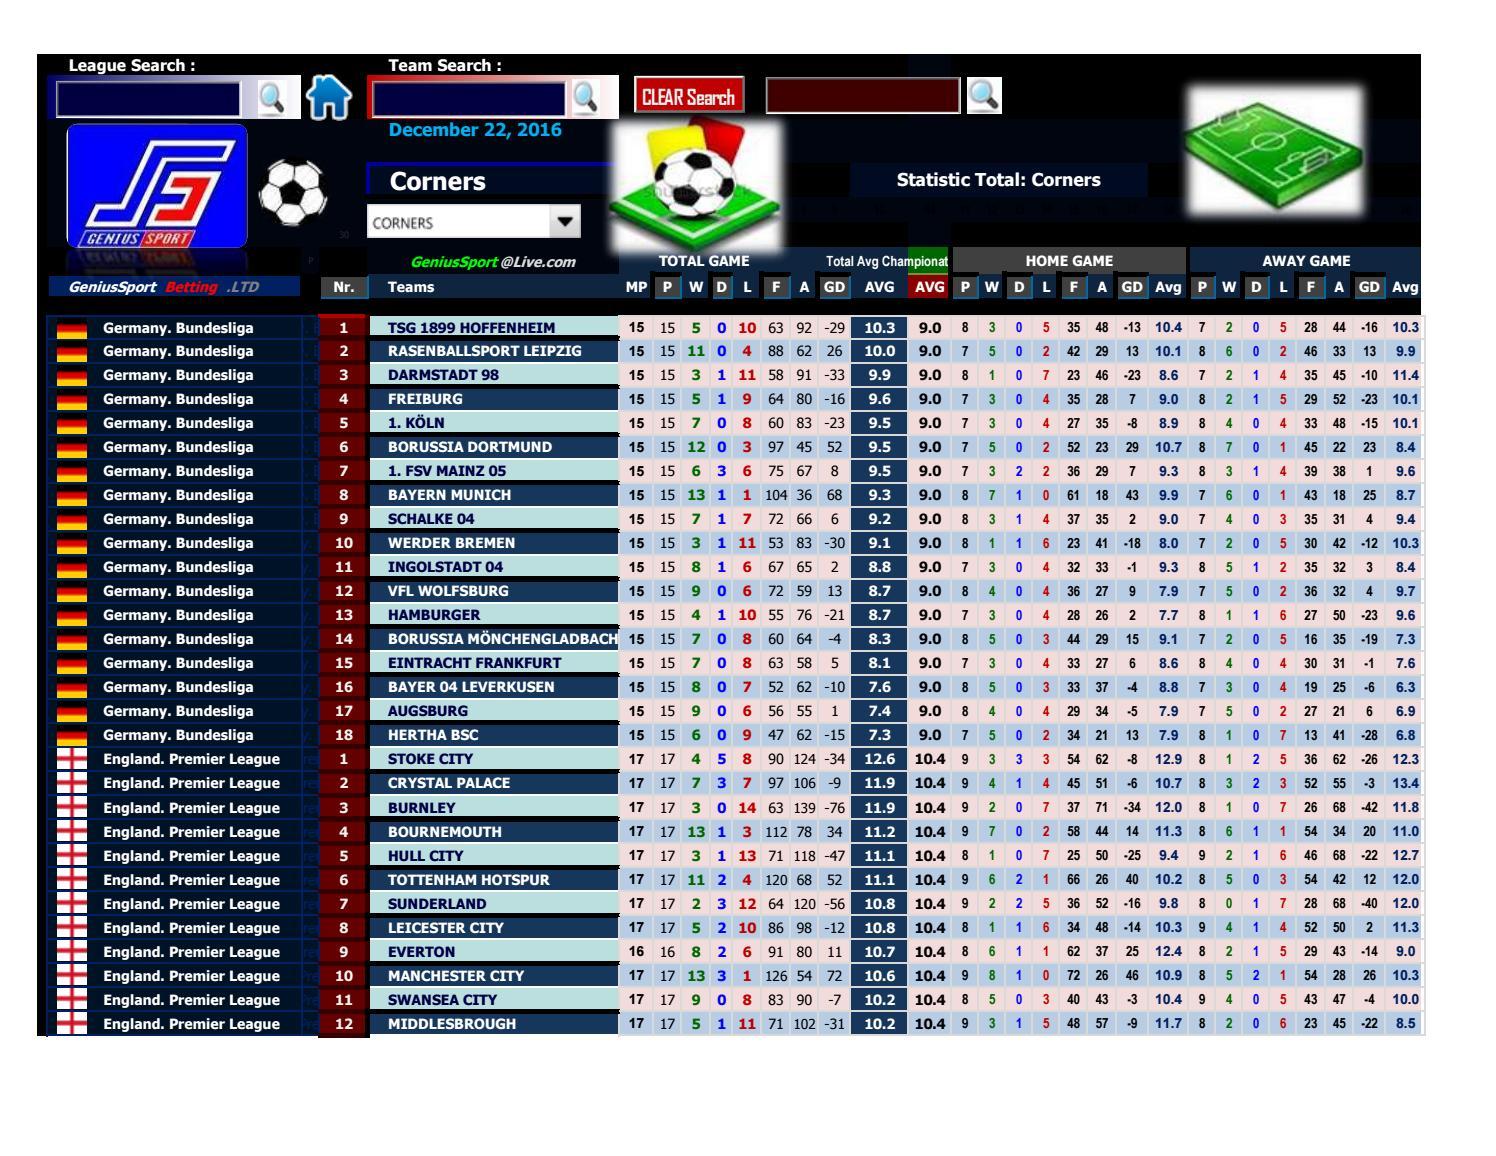 Effodeildin betting on sports bet big on marijuana